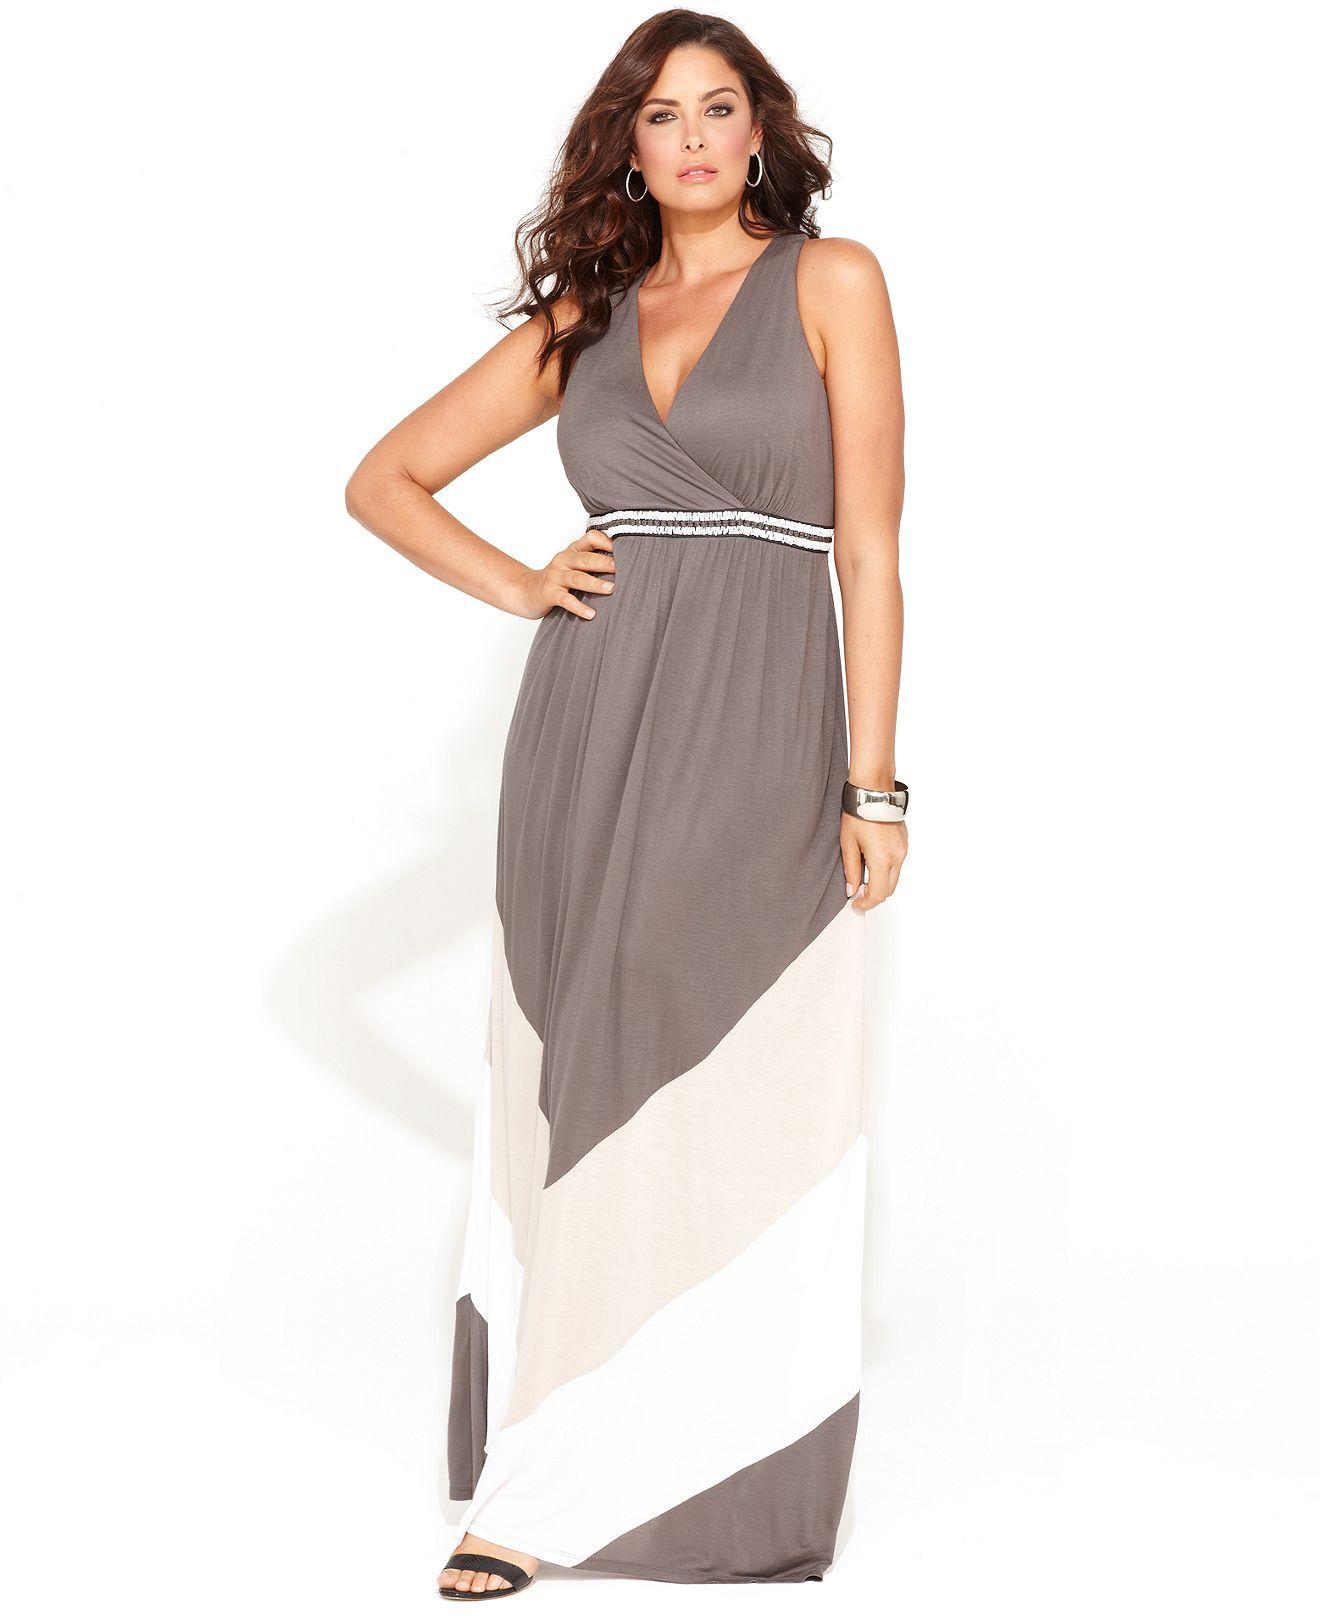 Inc international concepts plus size dress blue fabricbut make